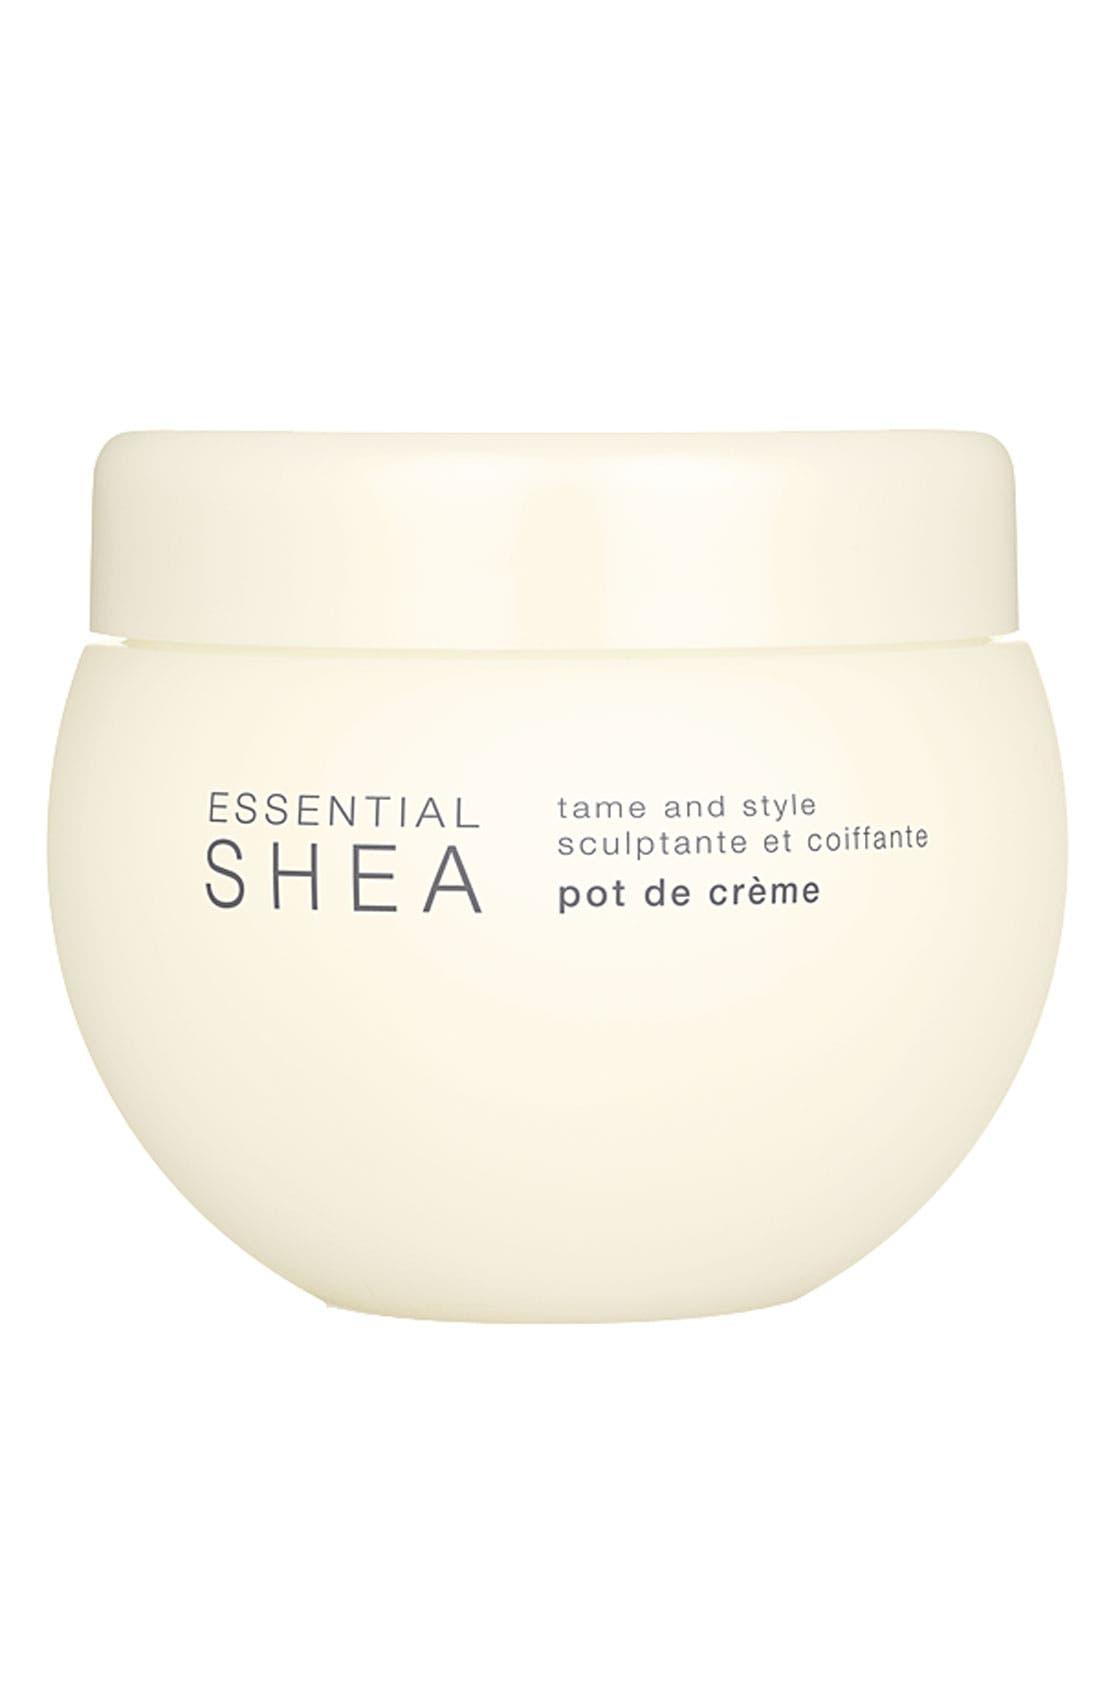 Fekkai 'Essential Shea' Pot de Crème, Main, color, 000